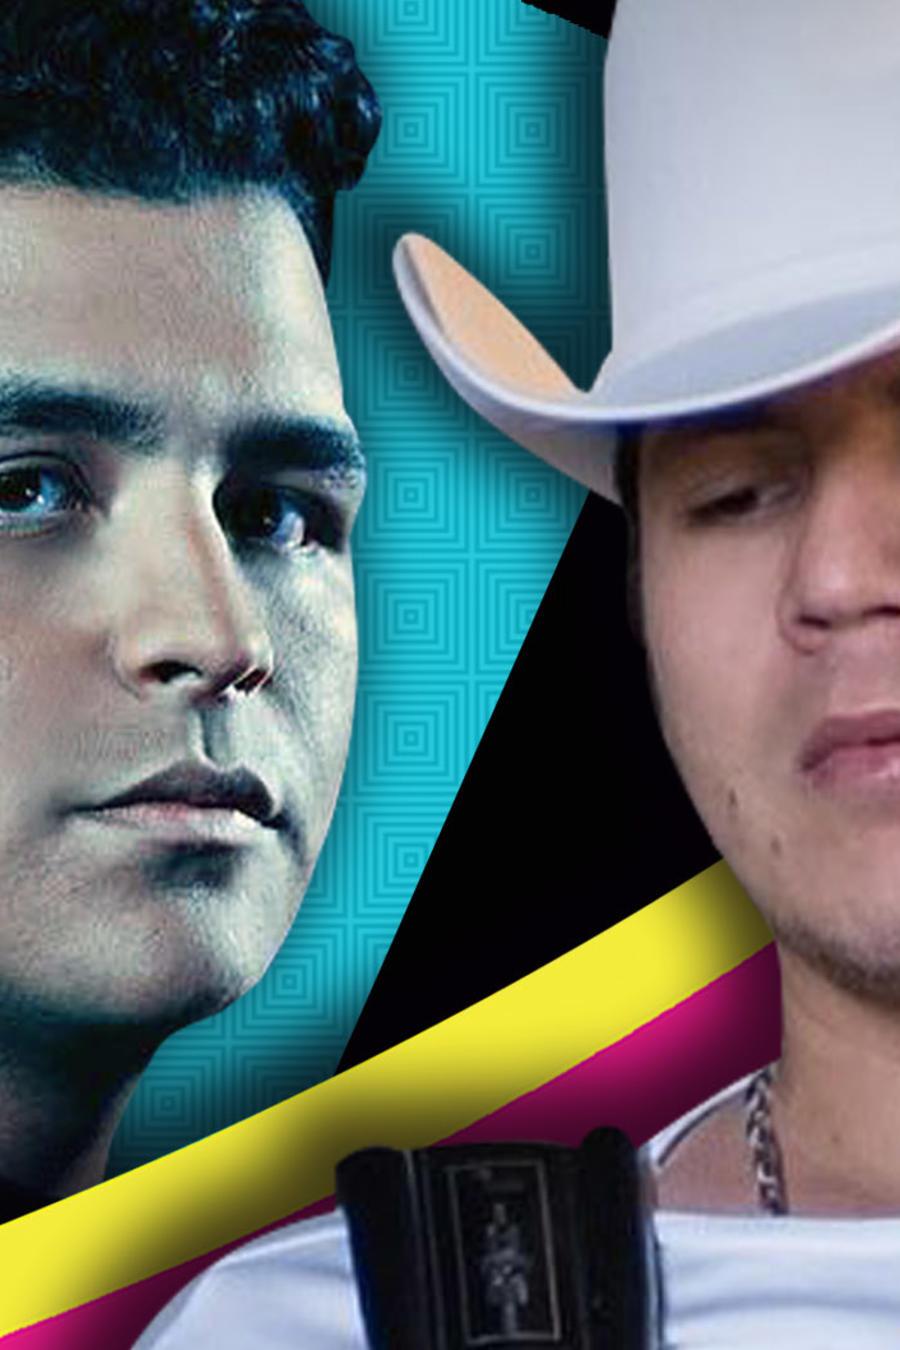 Remmy Valenzuela arremete contra Christian Nodal